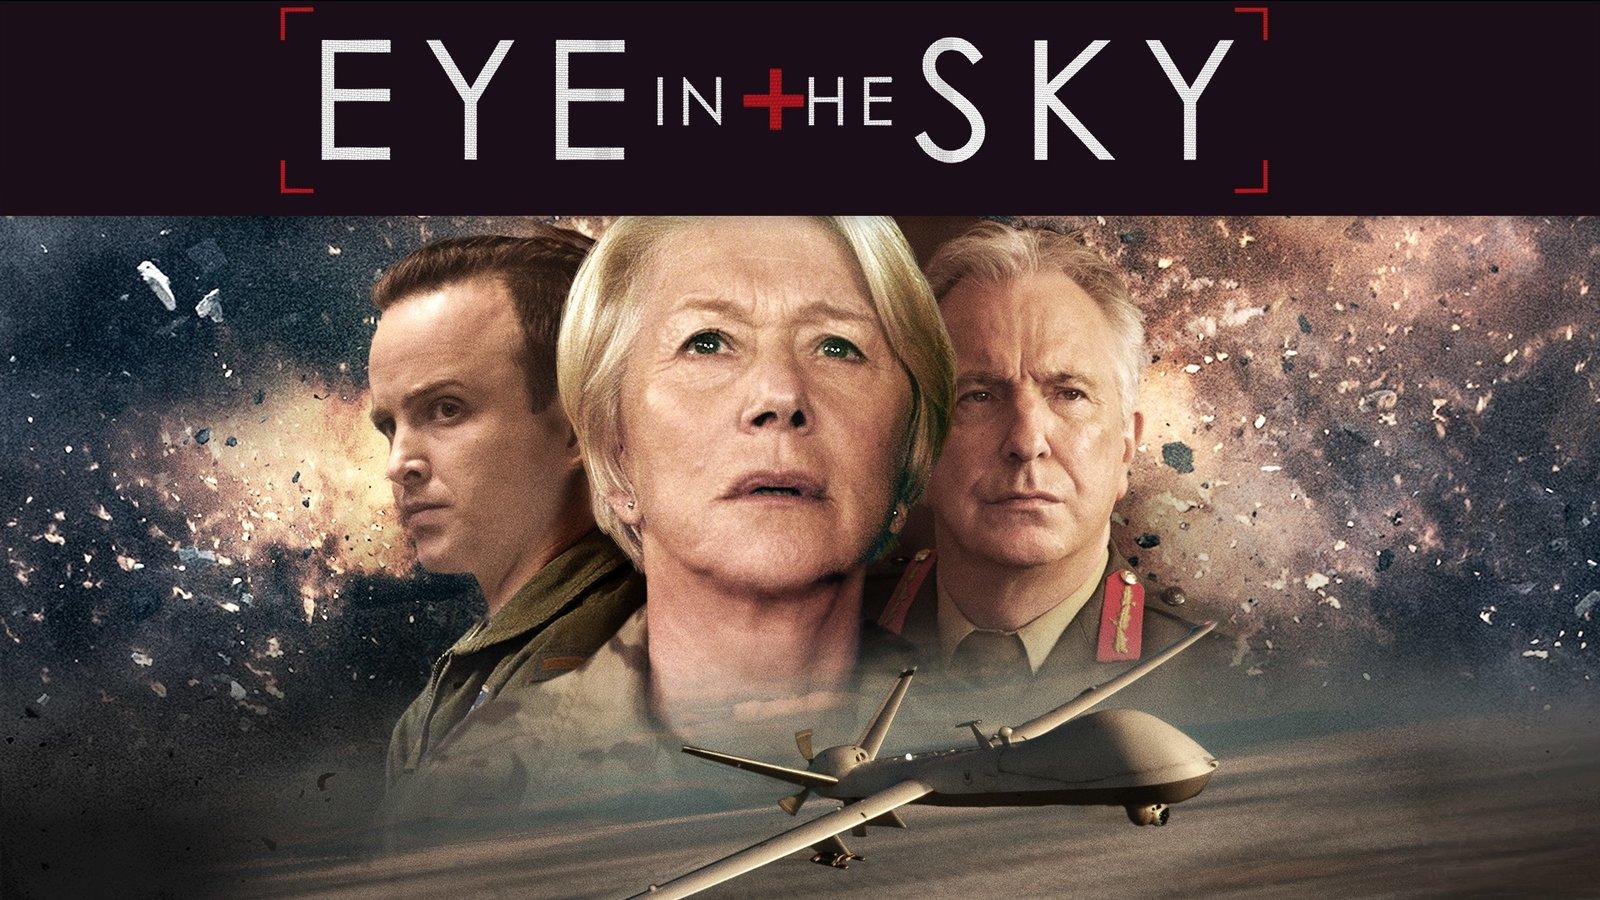 Eye in the Sky - In letzter Sekunde kostenlos im Stream - IMDb 7,3/10 (SWR Mediathek)